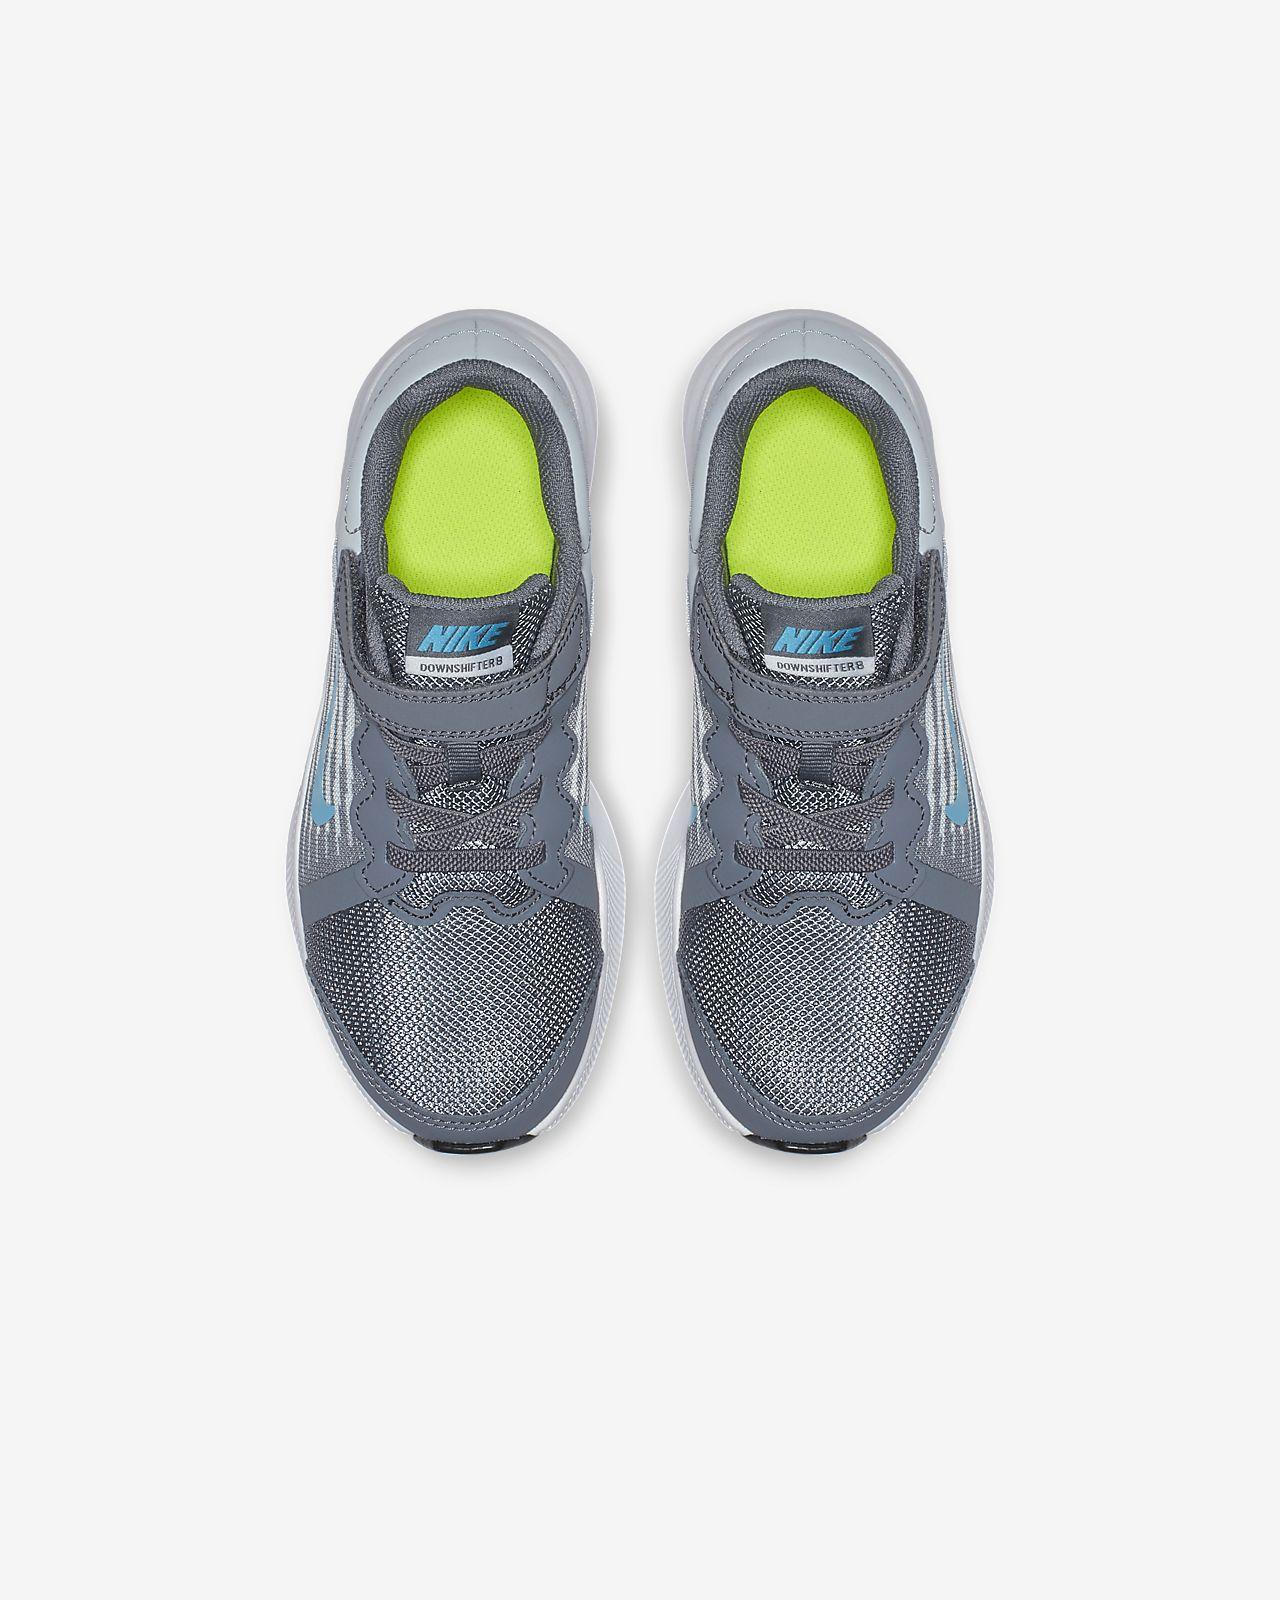 9300939b8dfe Nike Downshifter 8 Younger Kids  Shoe. Nike.com SA